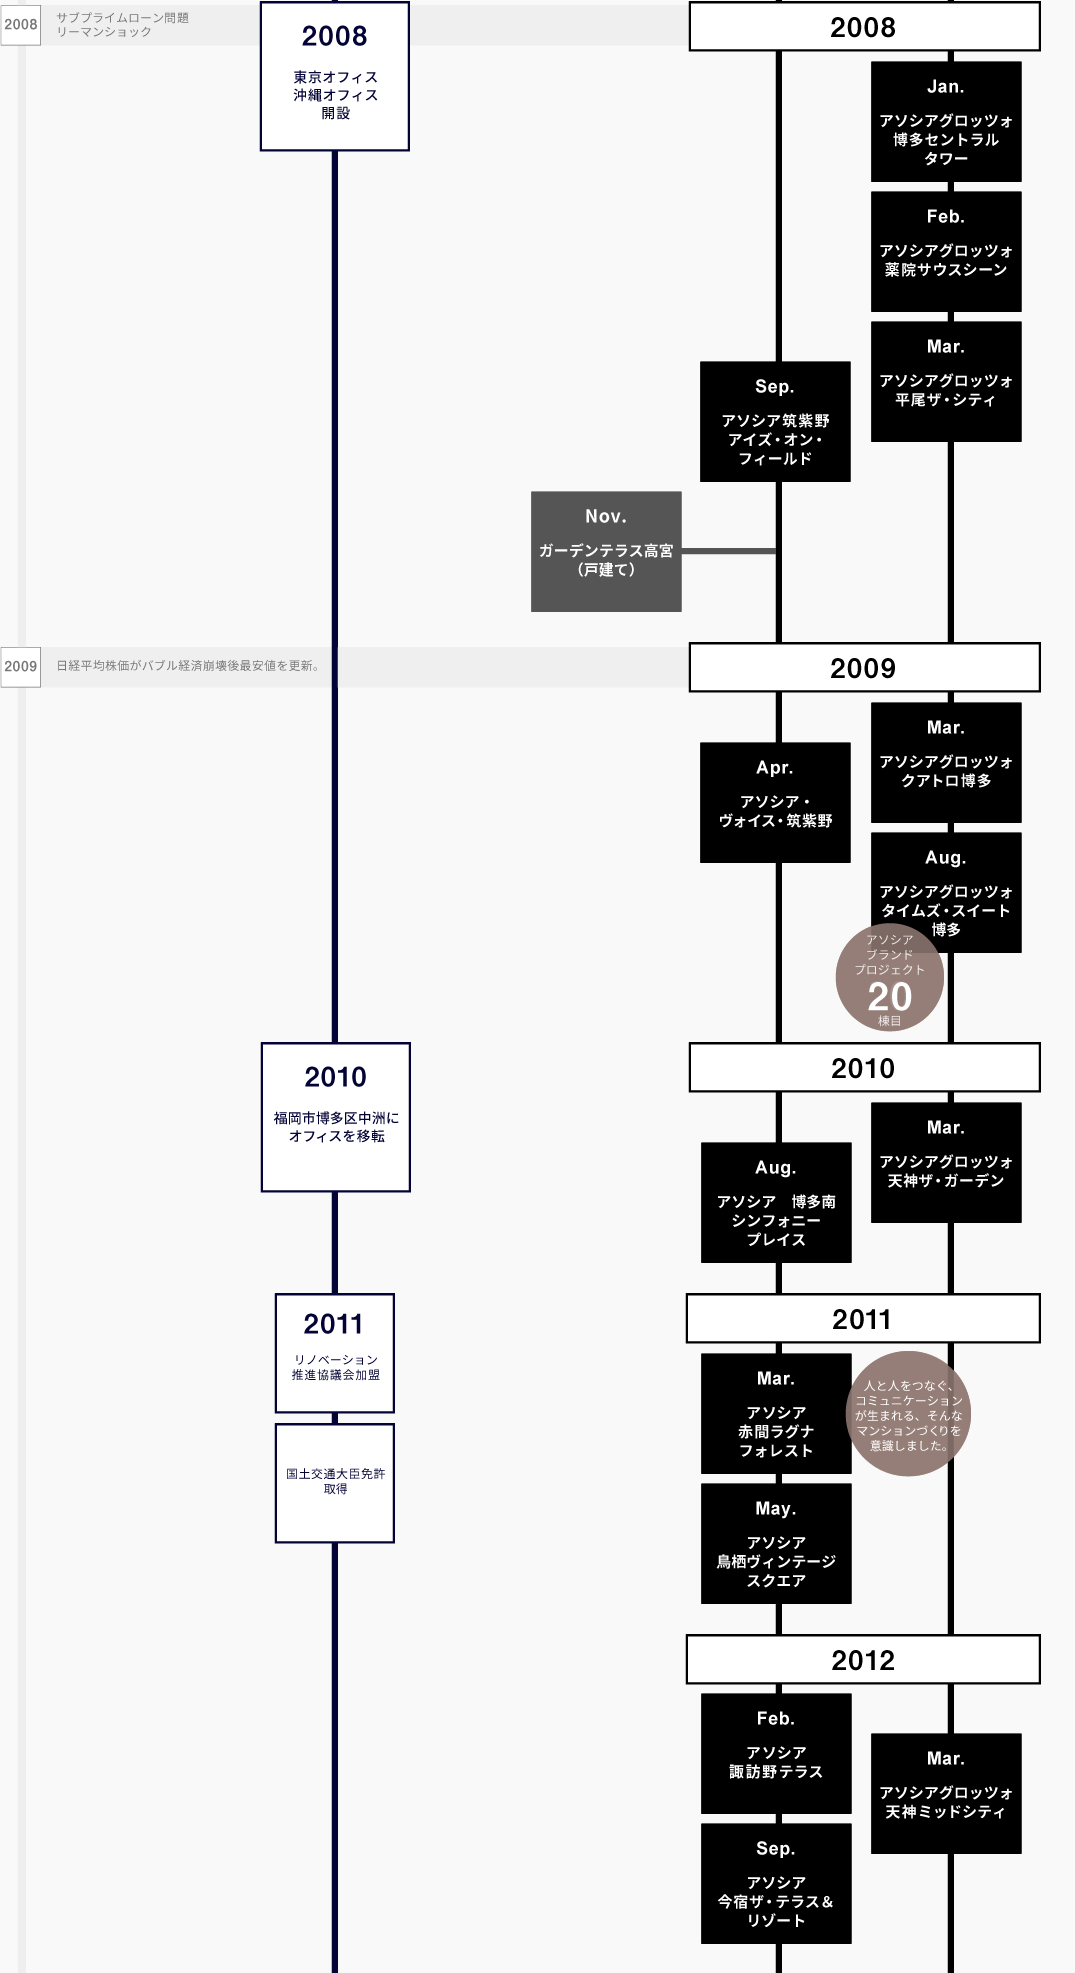 LANDICの歴史2008-2012